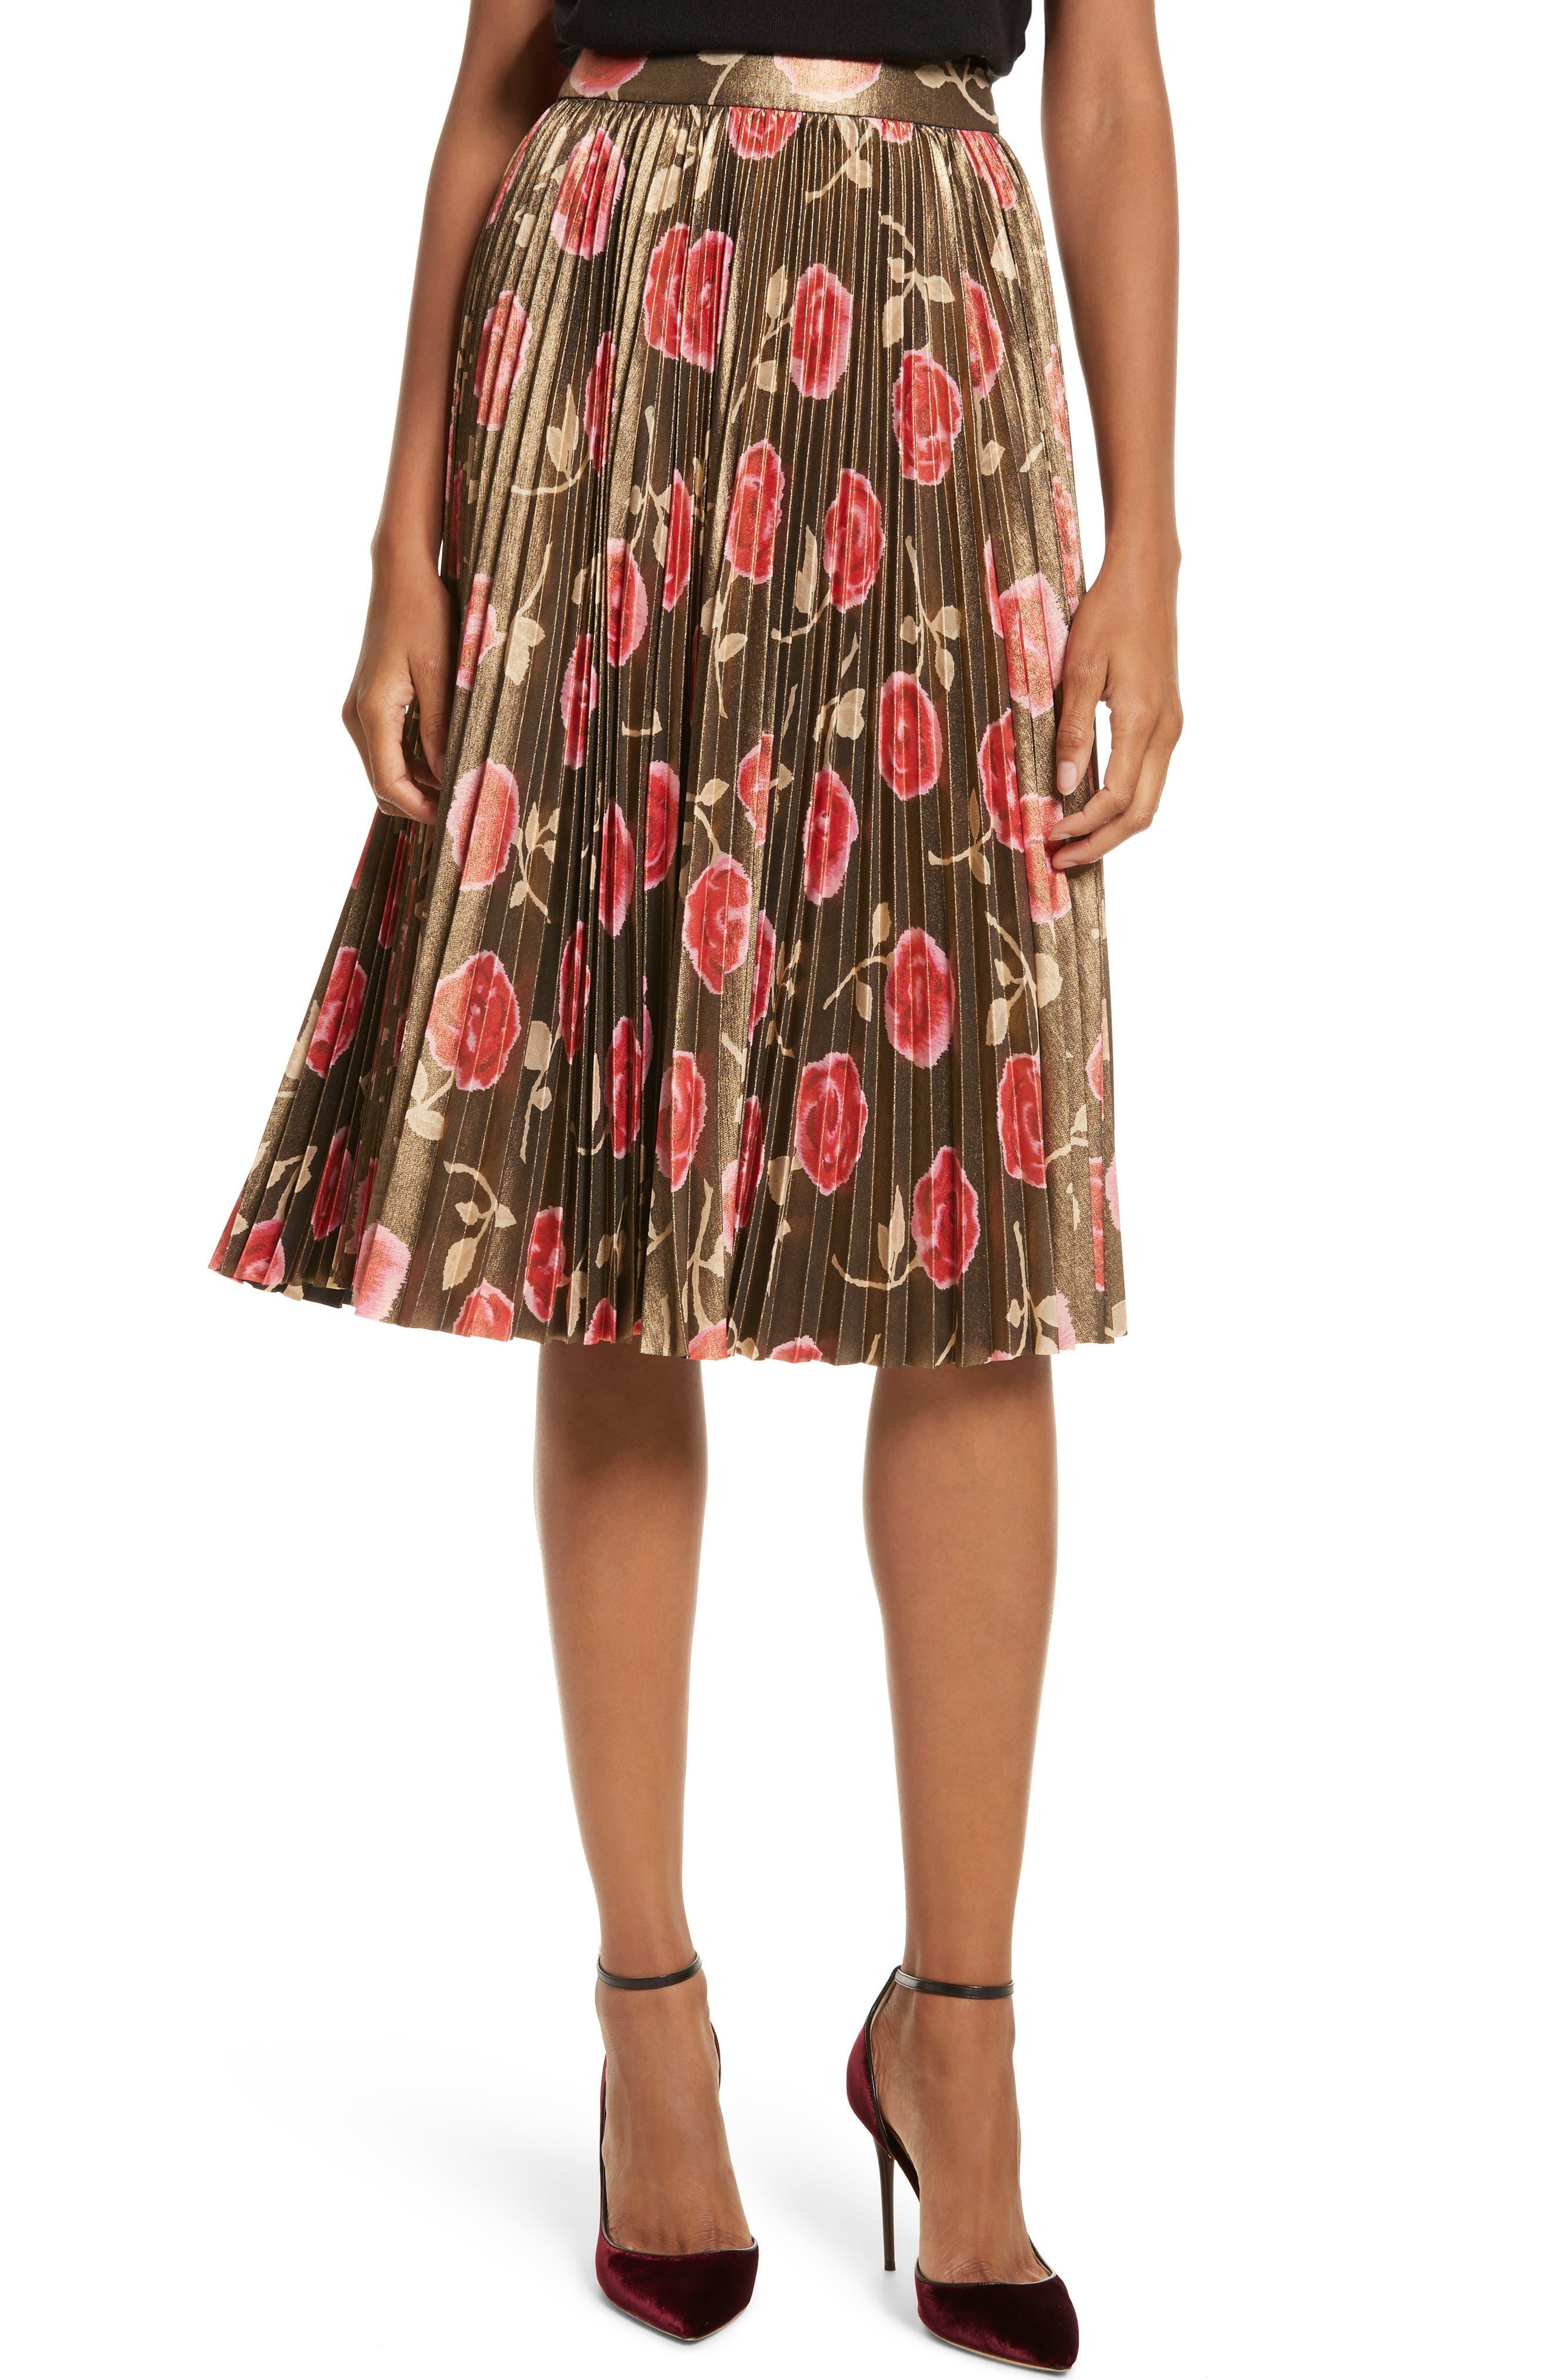 Alternate Image 1 Selected - kate spade new york hazy rose pleated metallic skirt